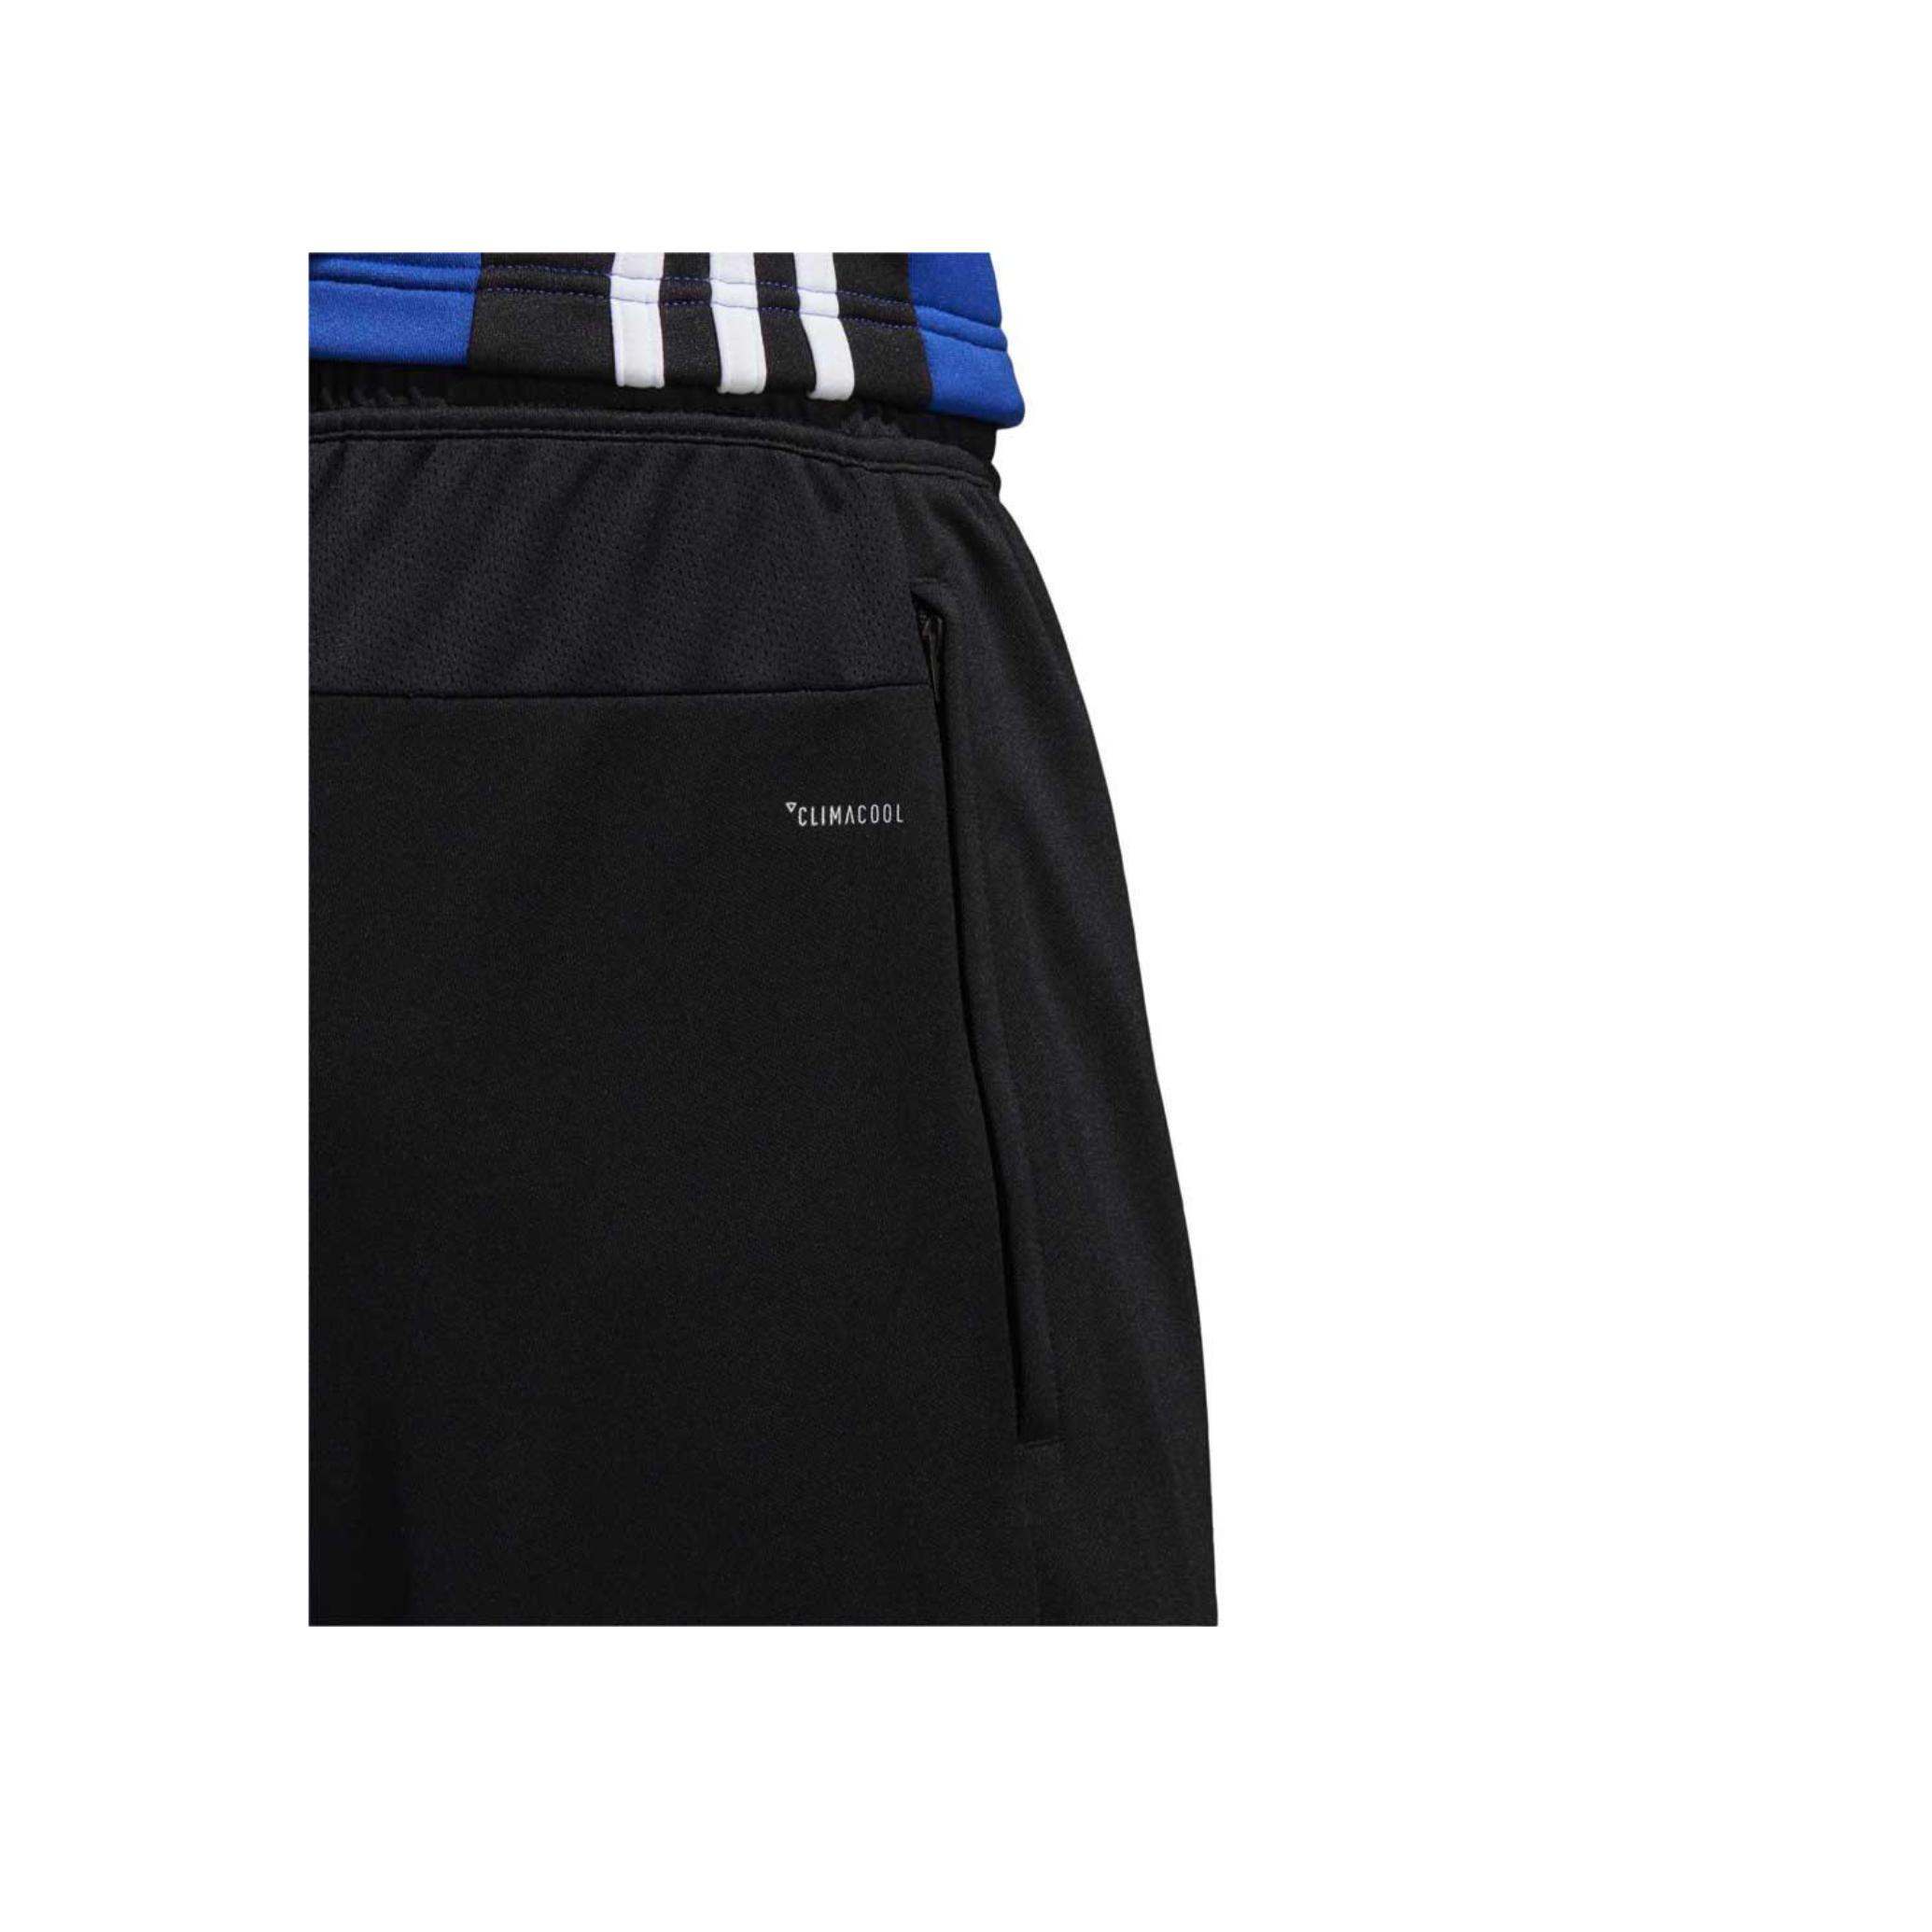 pantaloni regista adidas